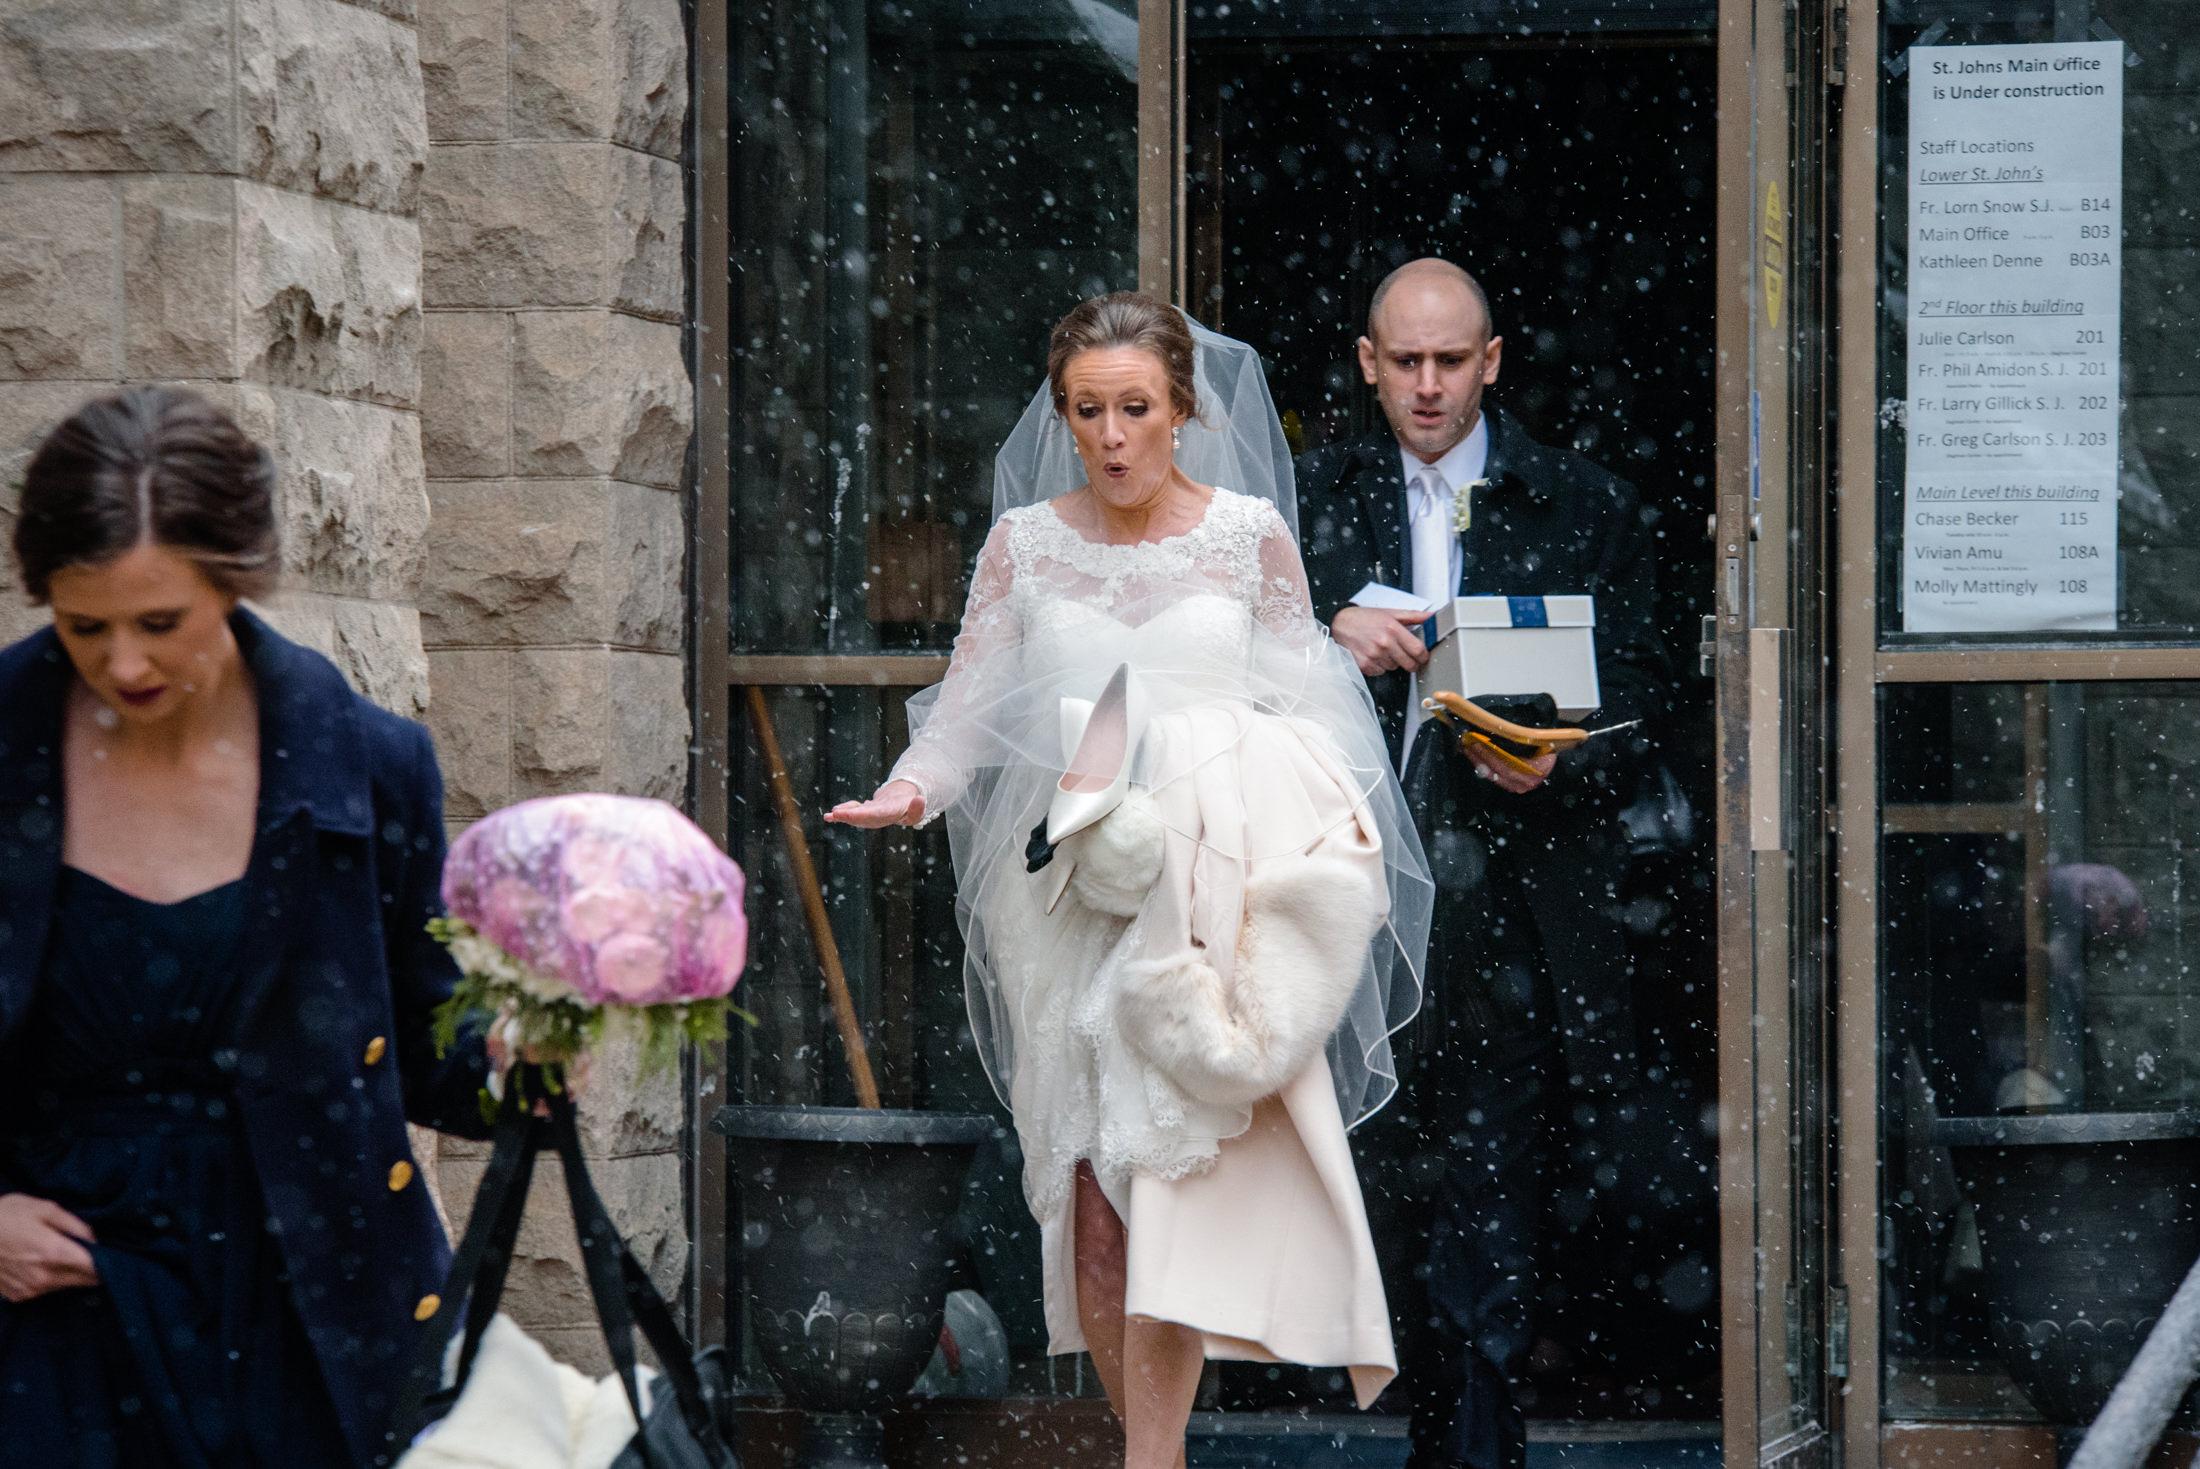 st-johns-creighton-omaha-wedding-photographer-jm-studios-0016.JPG